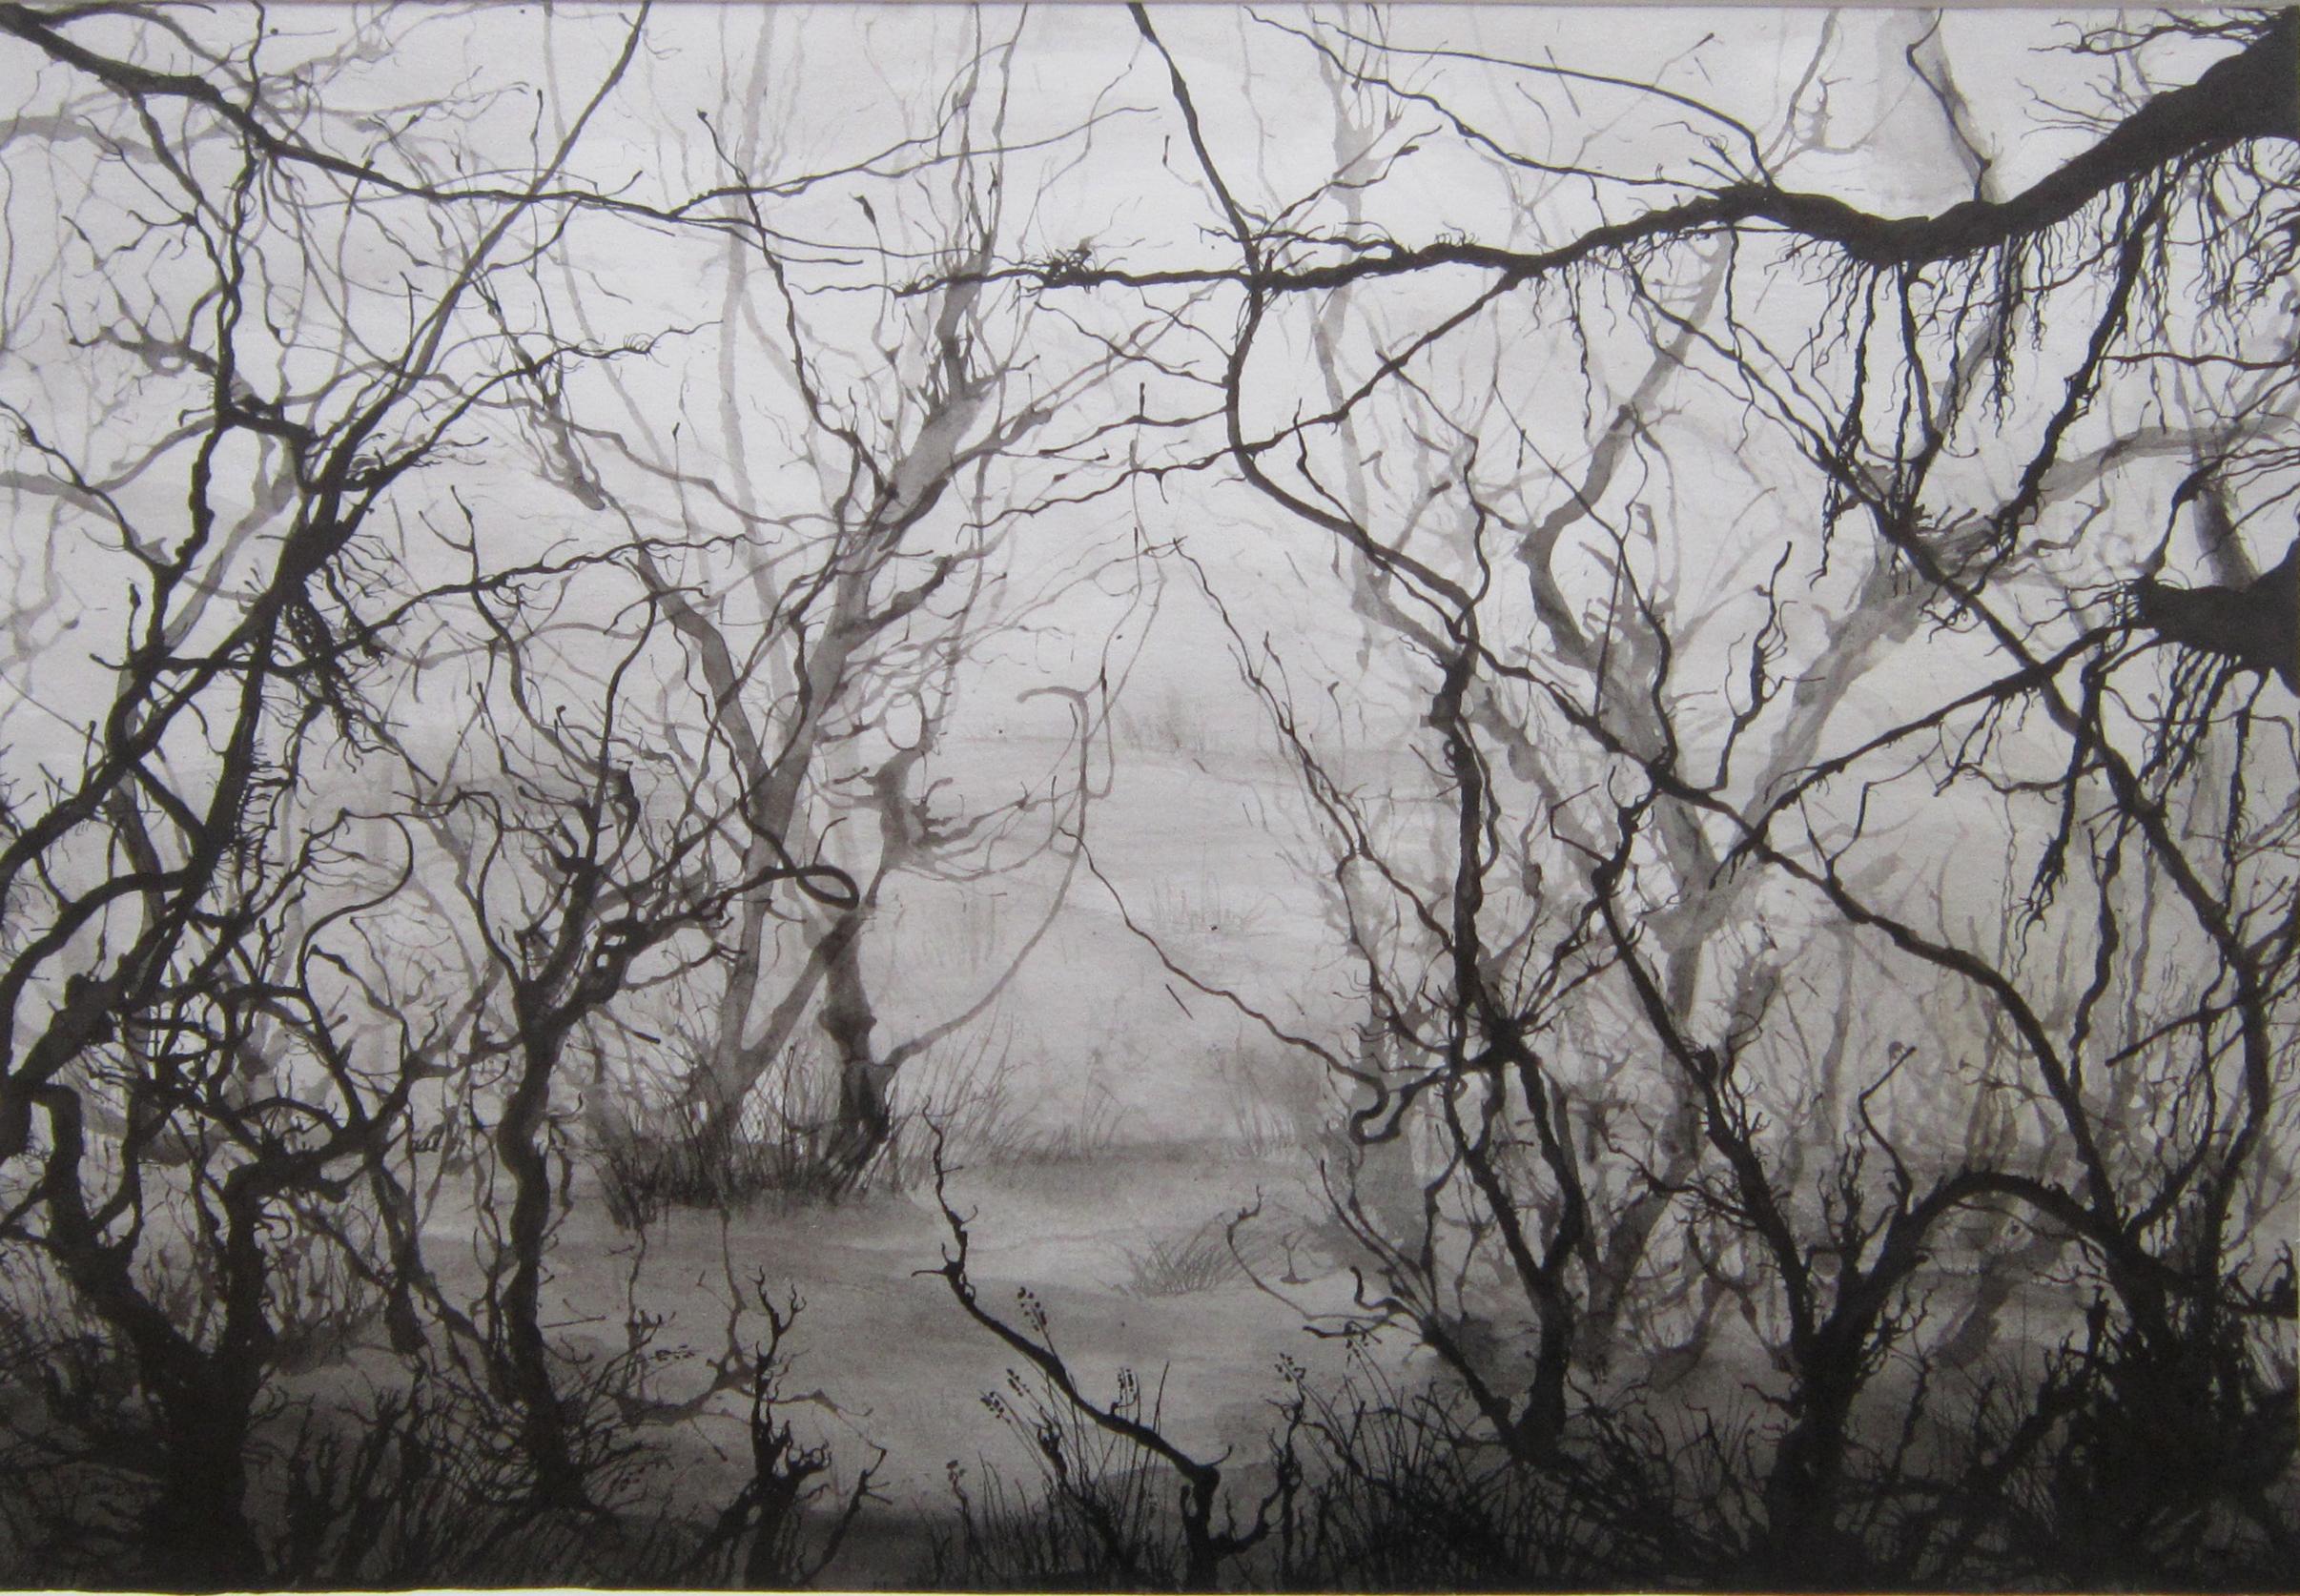 Mist 2, Oostindische inkt, 61 x 51, 2012